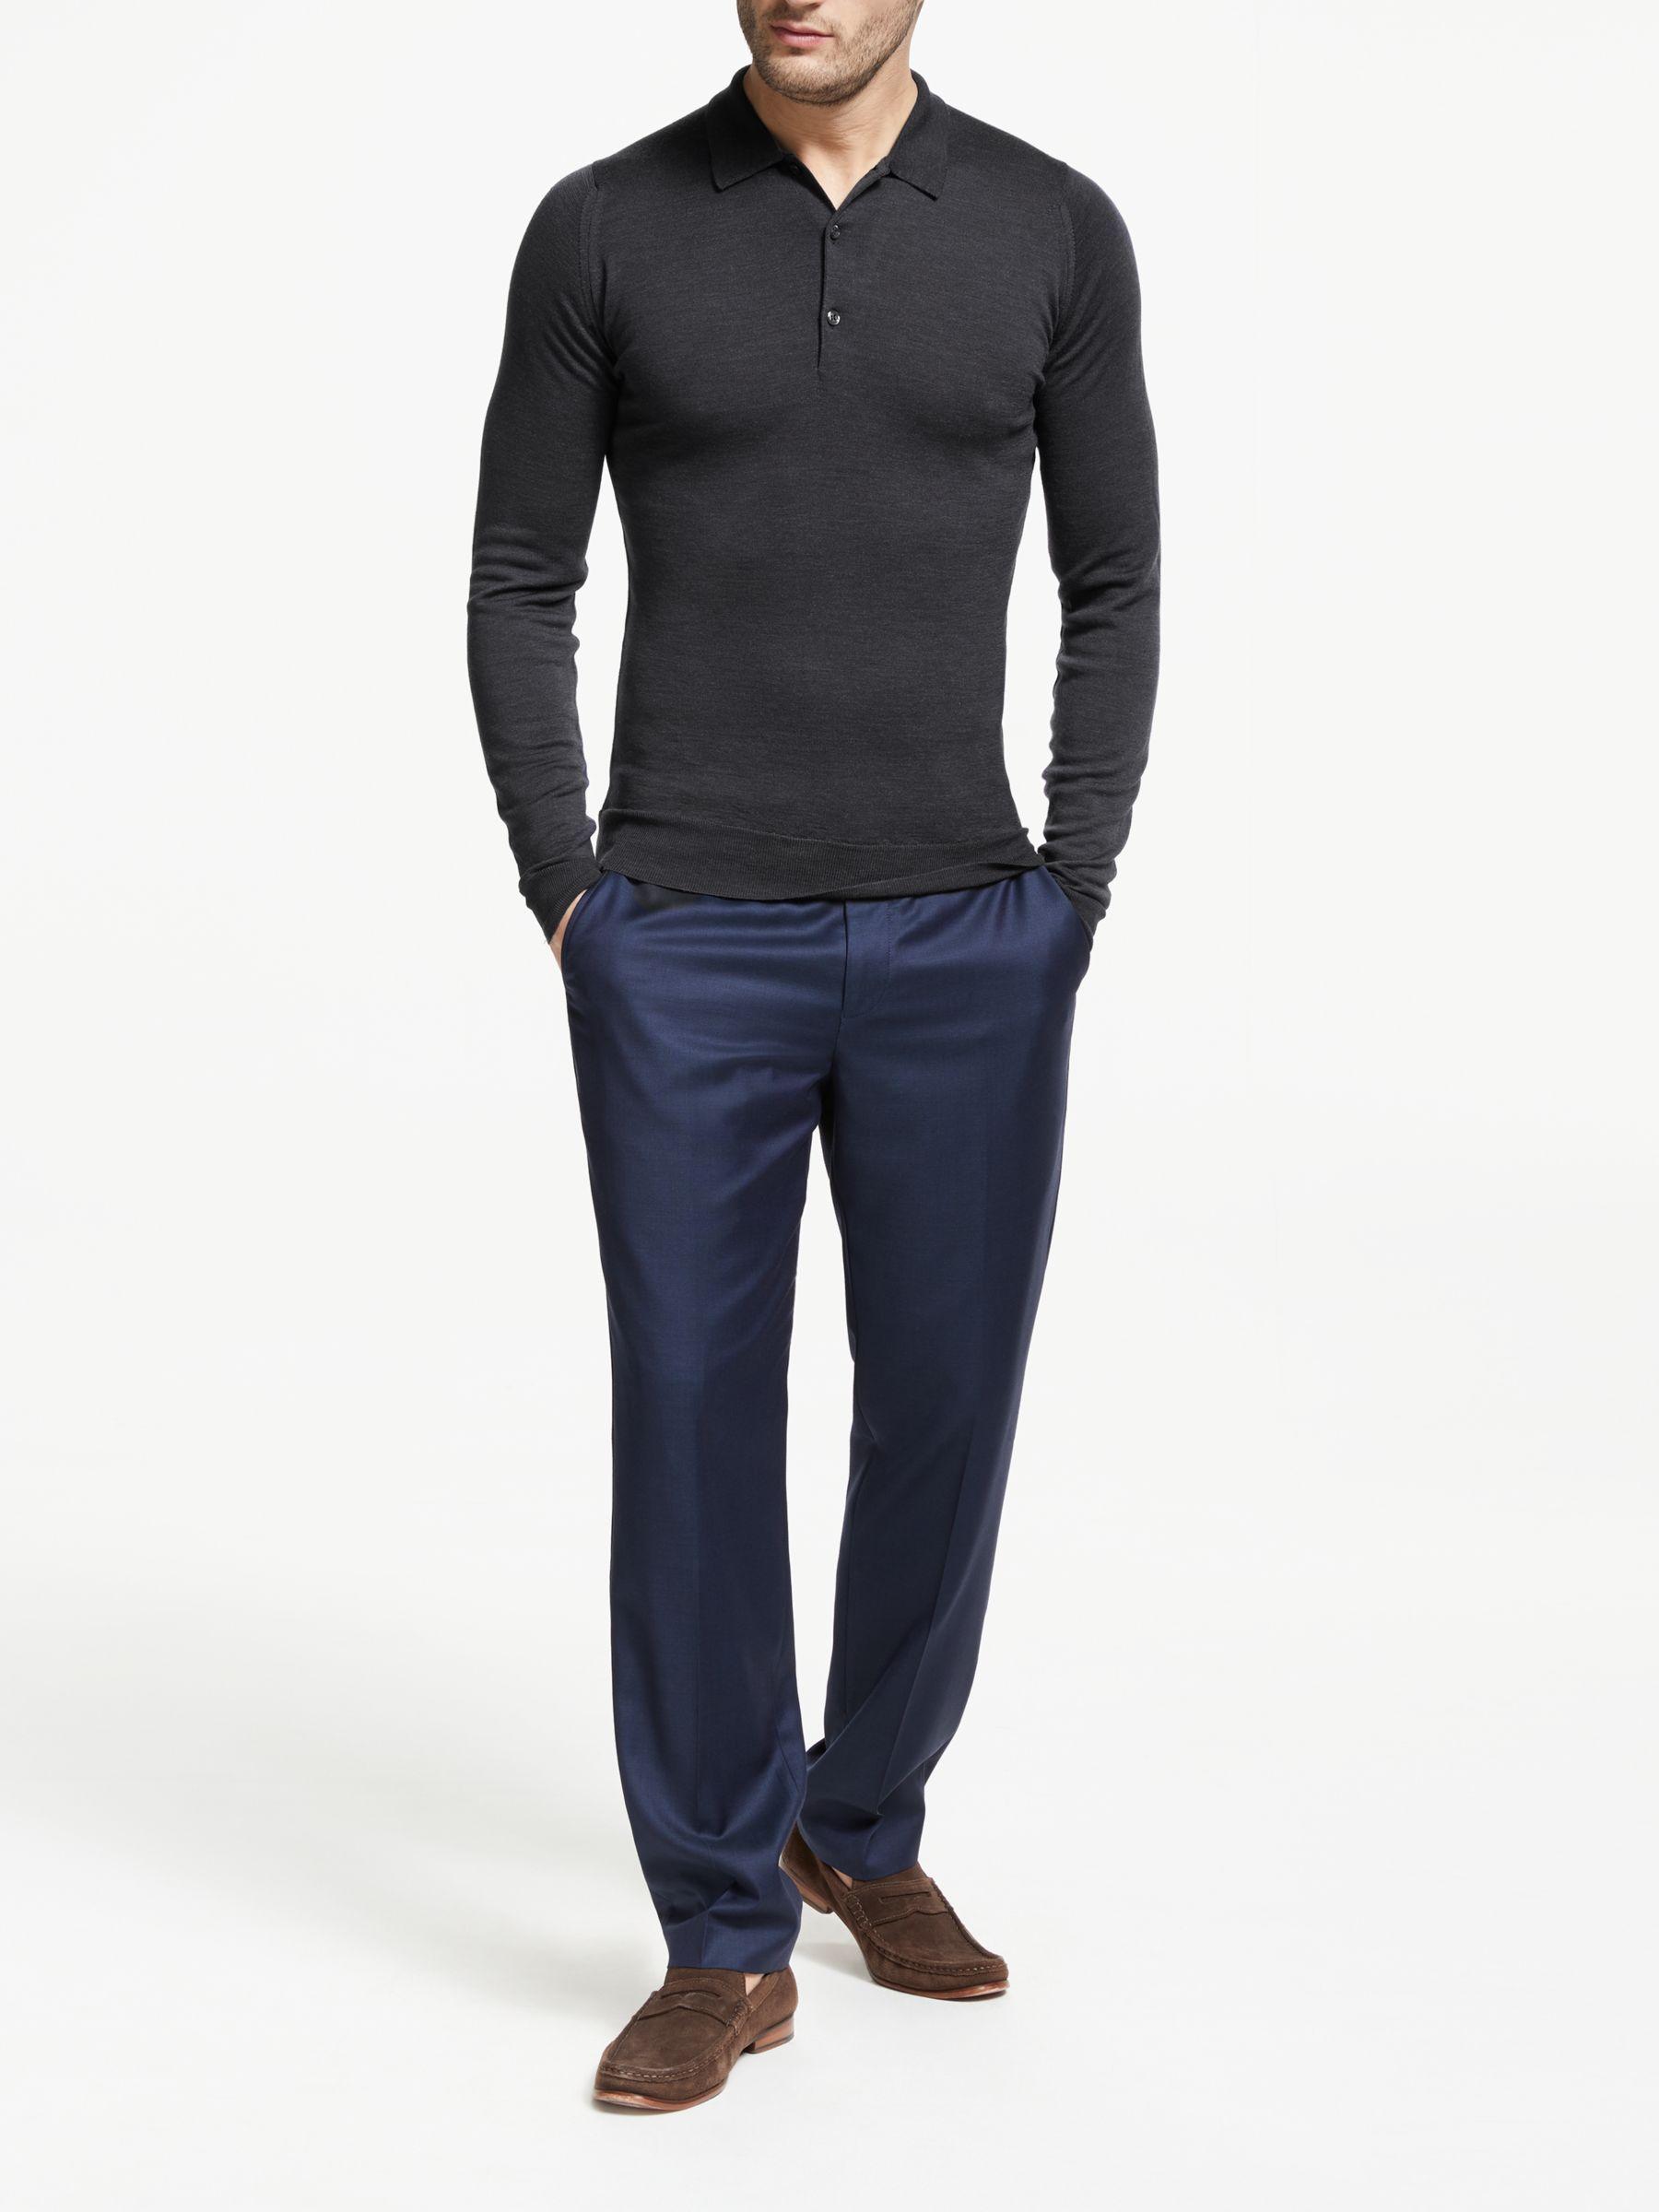 John Smedley Belper Long Sleeve Wool Polo Shirt, Blue in